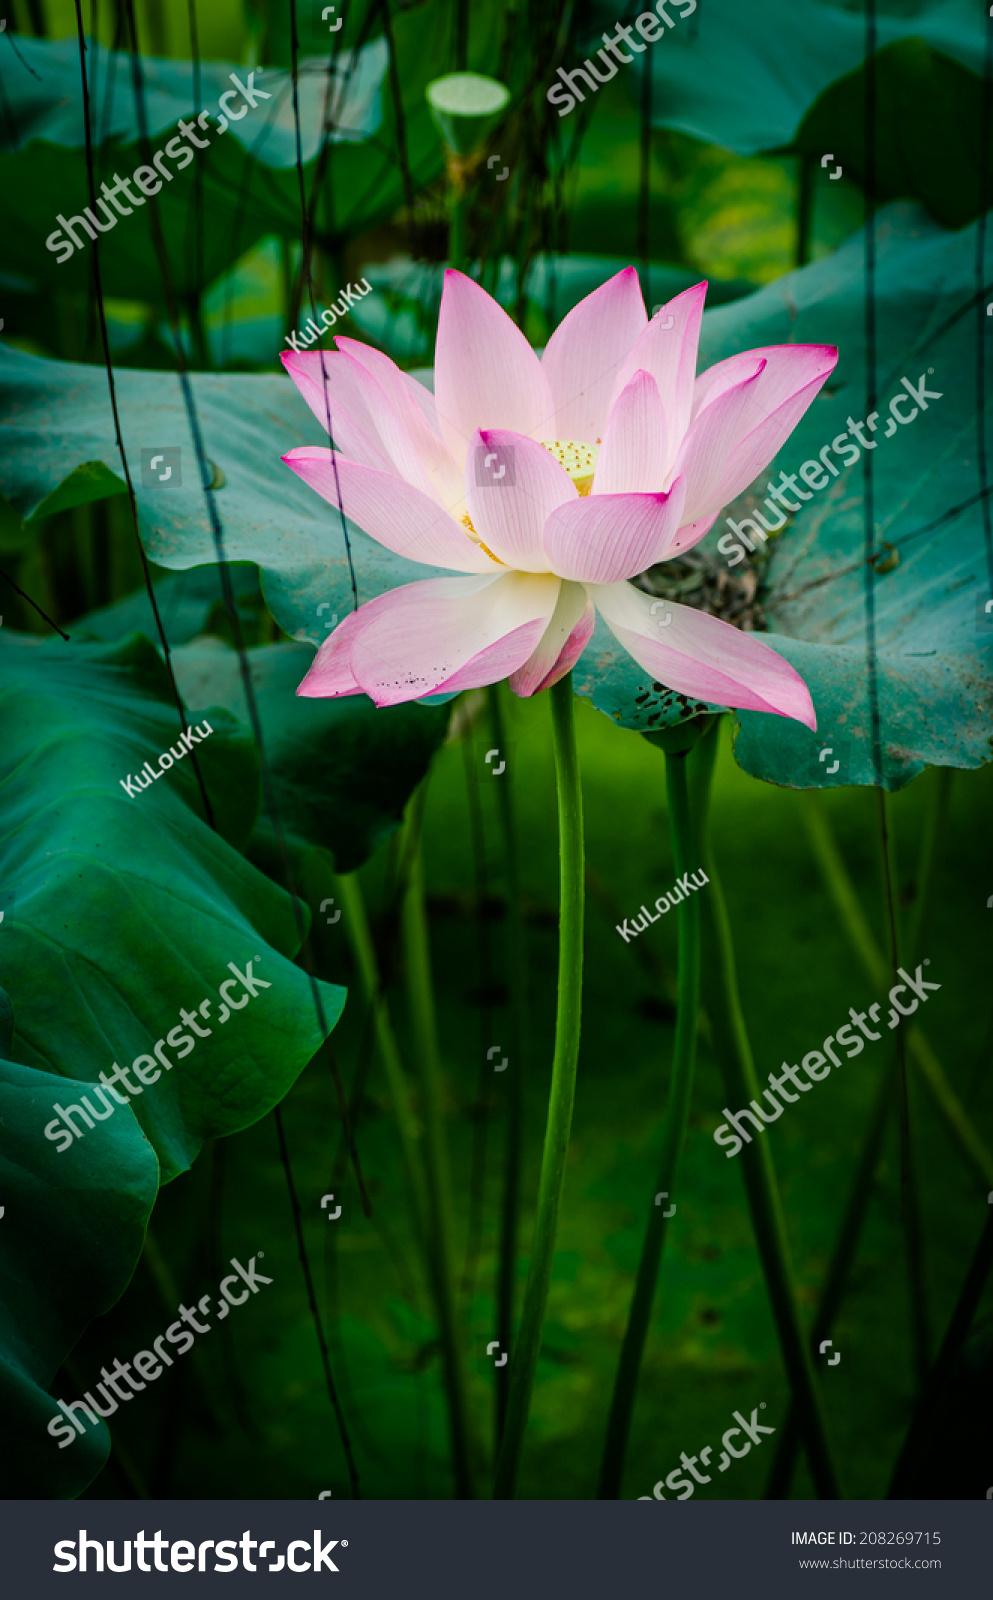 Beautiful lotus flower blooming stock photo royalty free 208269715 beautiful lotus flower blooming stock photo royalty free 208269715 shutterstock izmirmasajfo